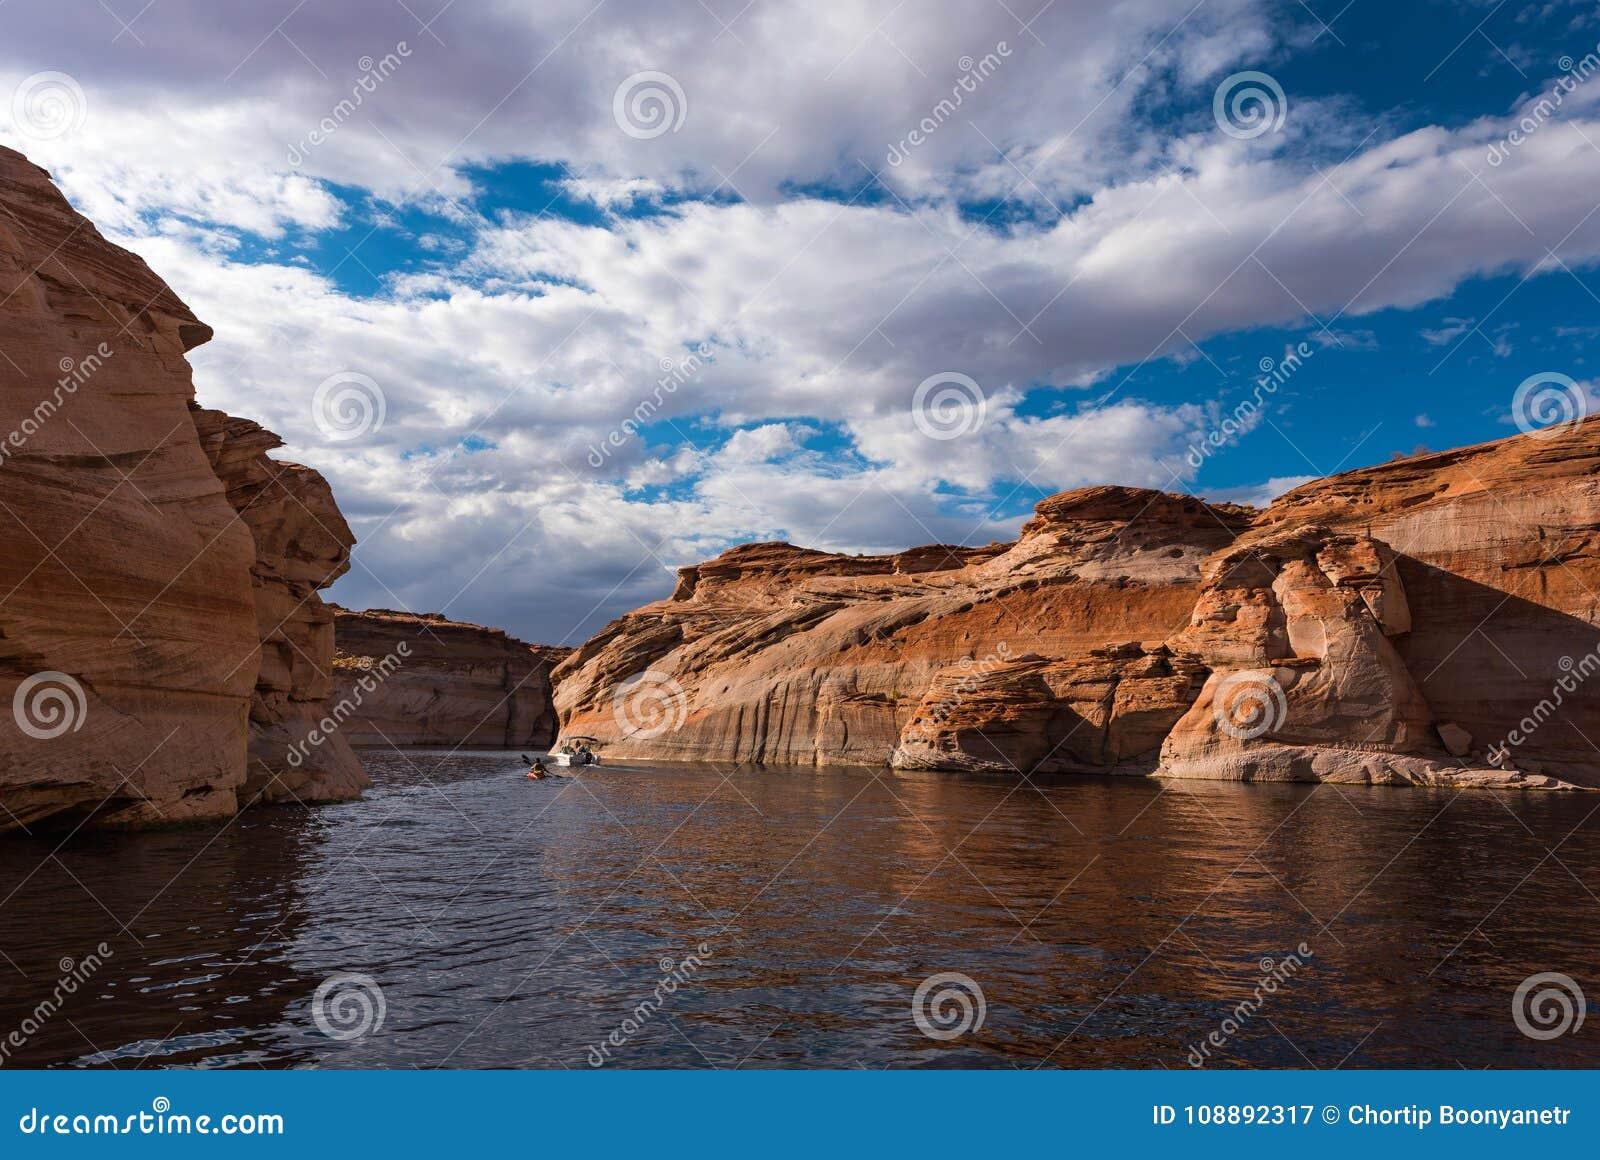 Sphinx like stone wall in Lake Powell